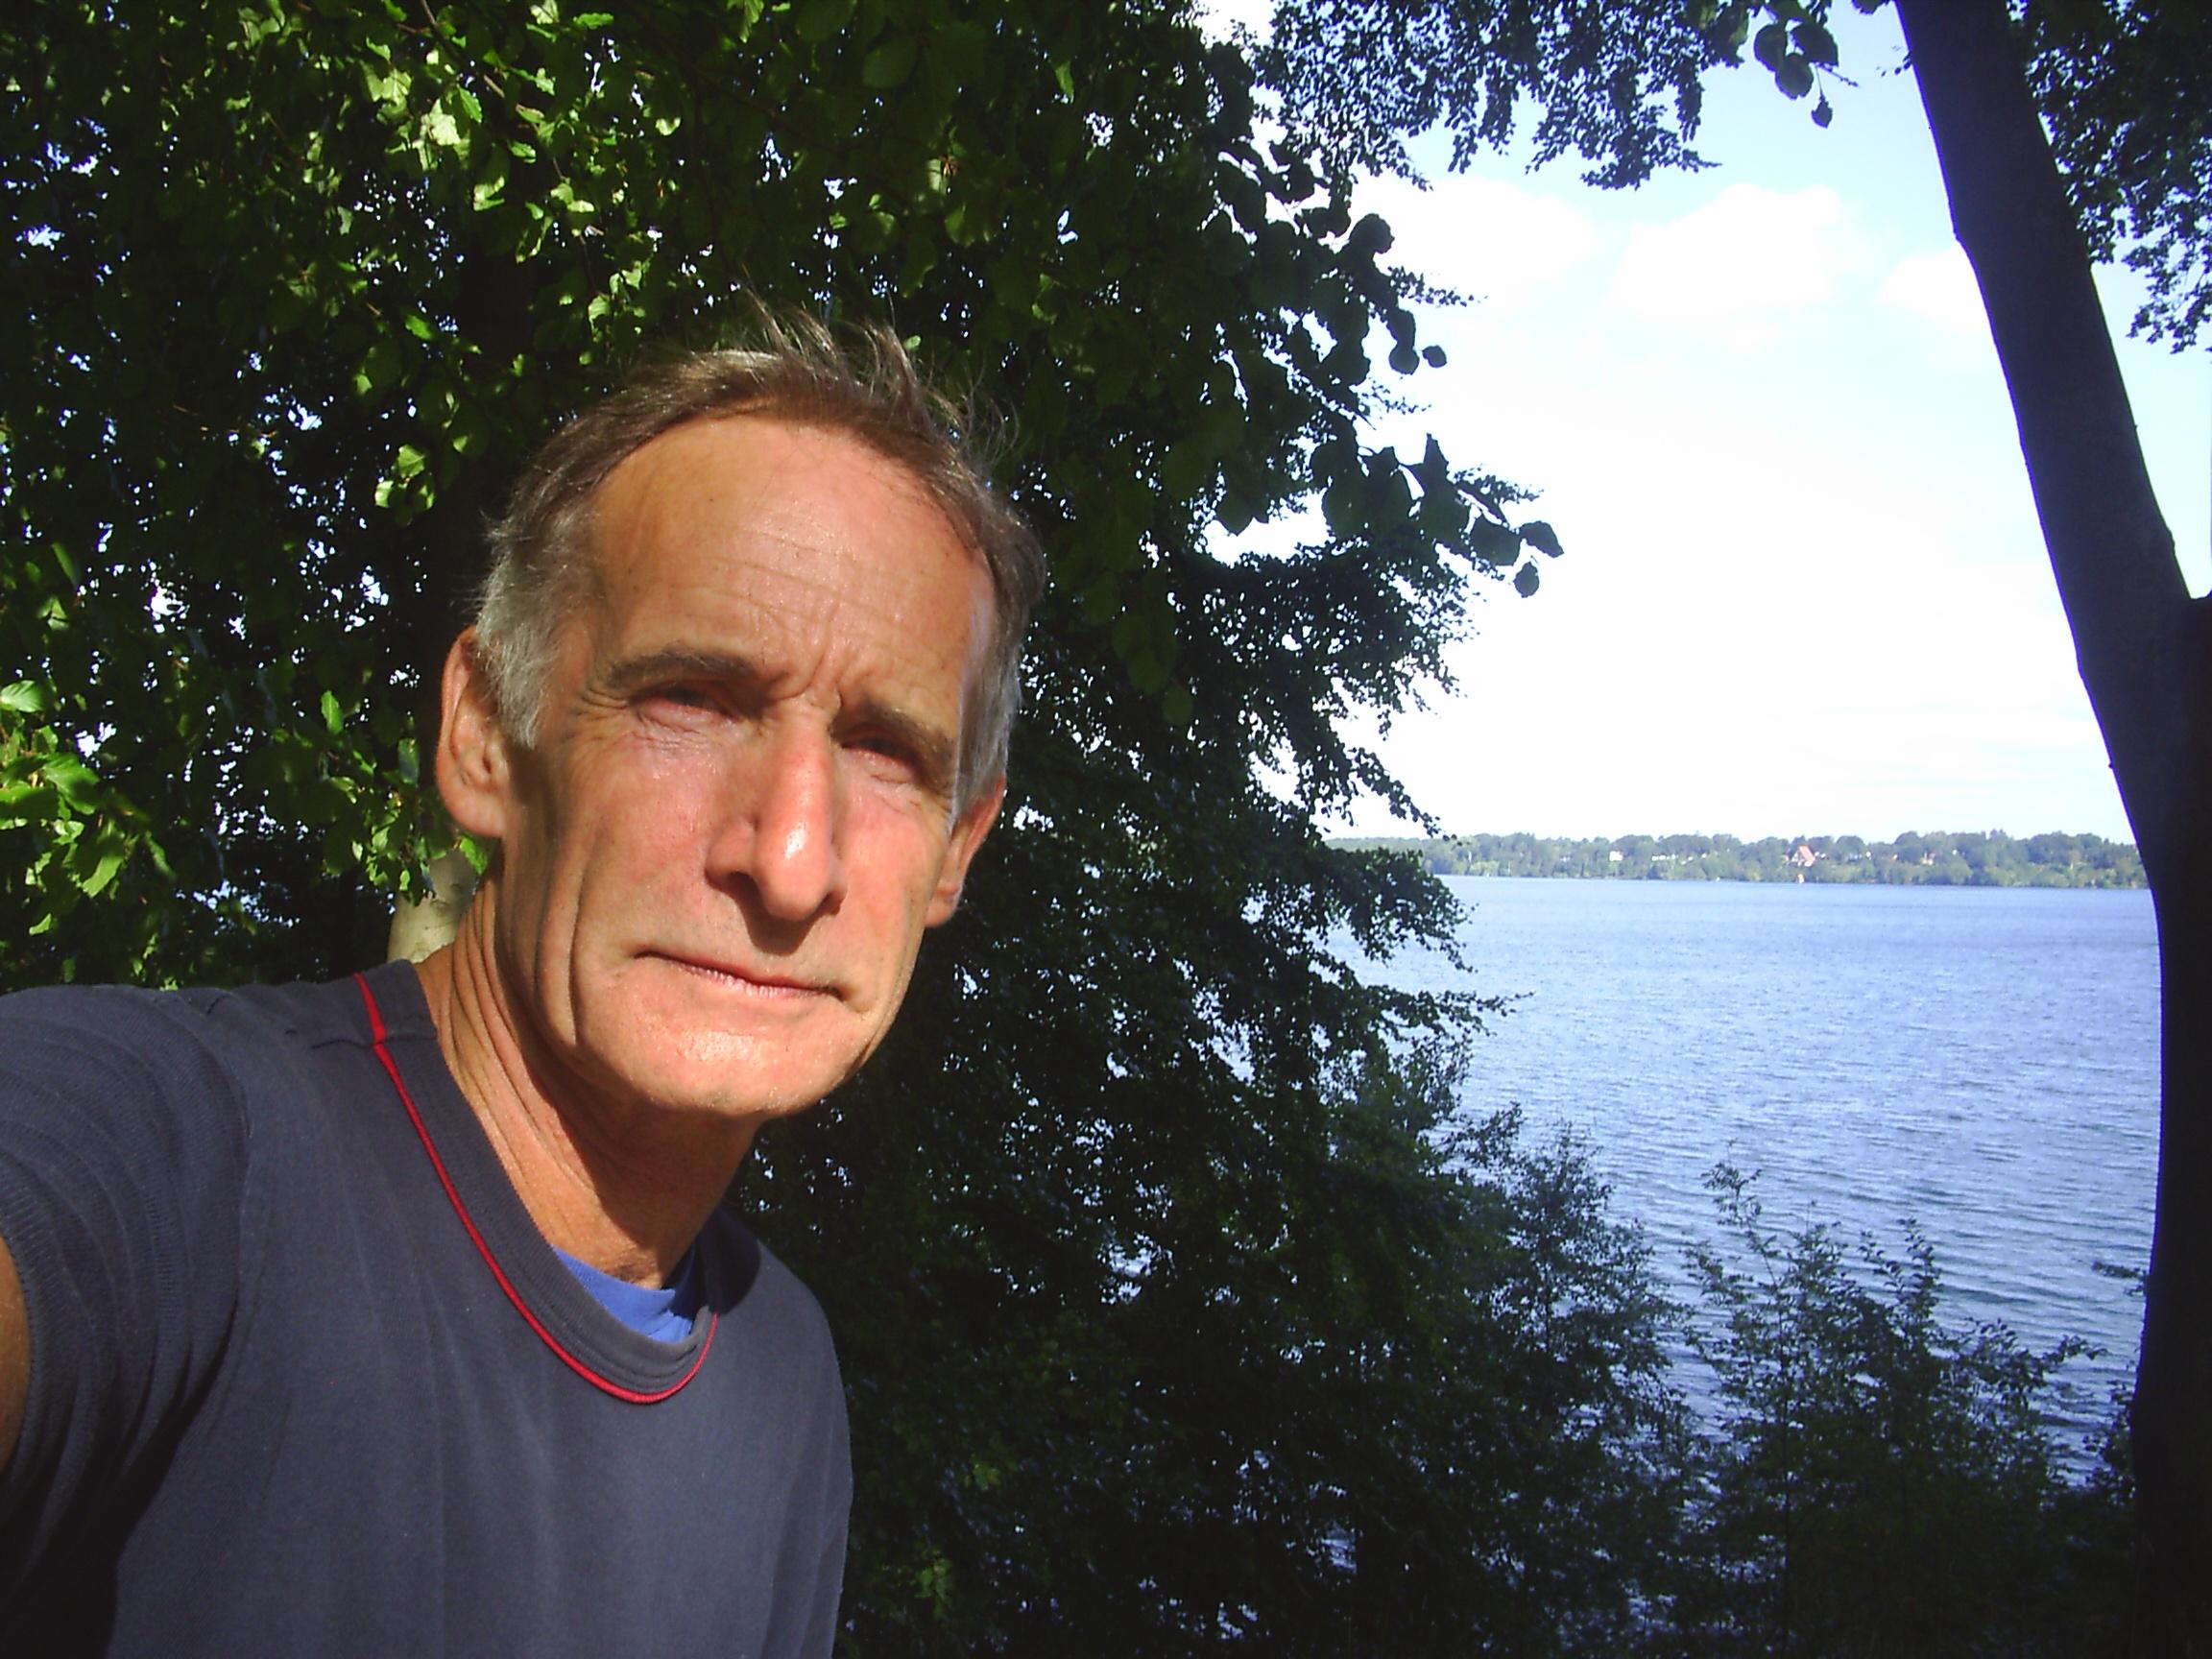 Erik K Abrahamsen, born 1945 in Skagen, Denmark. Photo september 2008 by Furesøen, Nordsjælland.